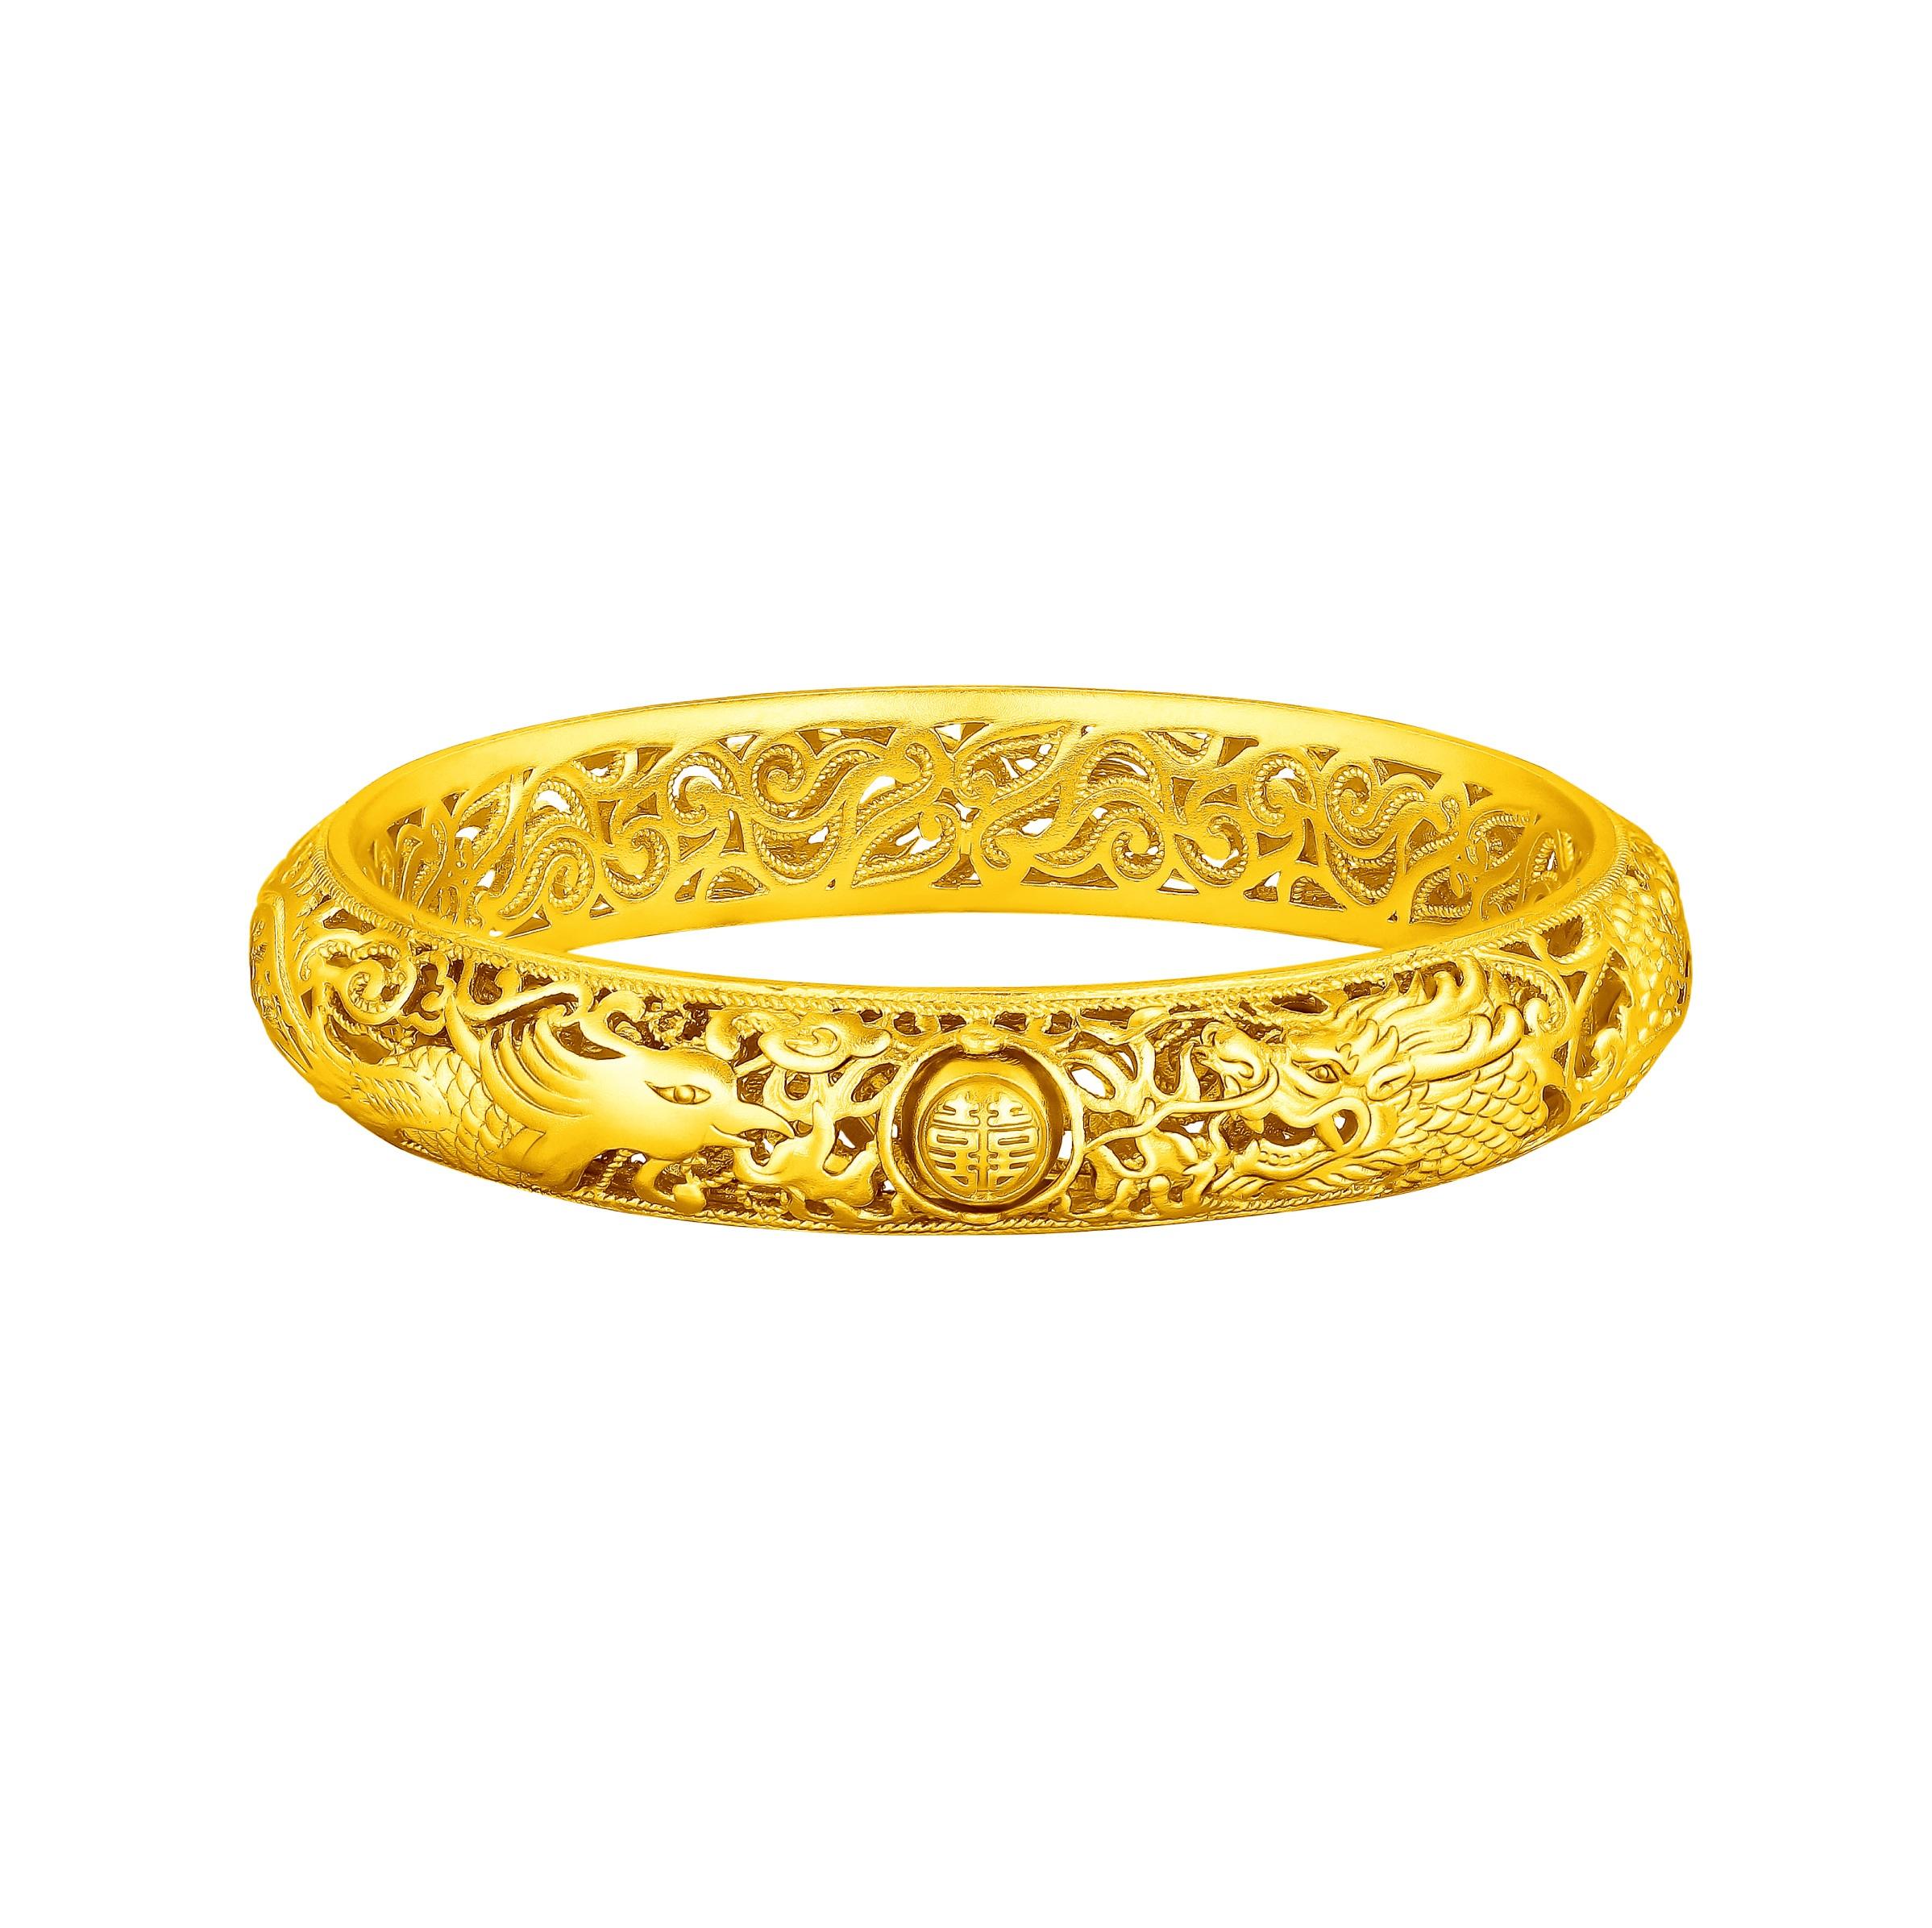 Antique Gold「慶福」Gold Bracelet